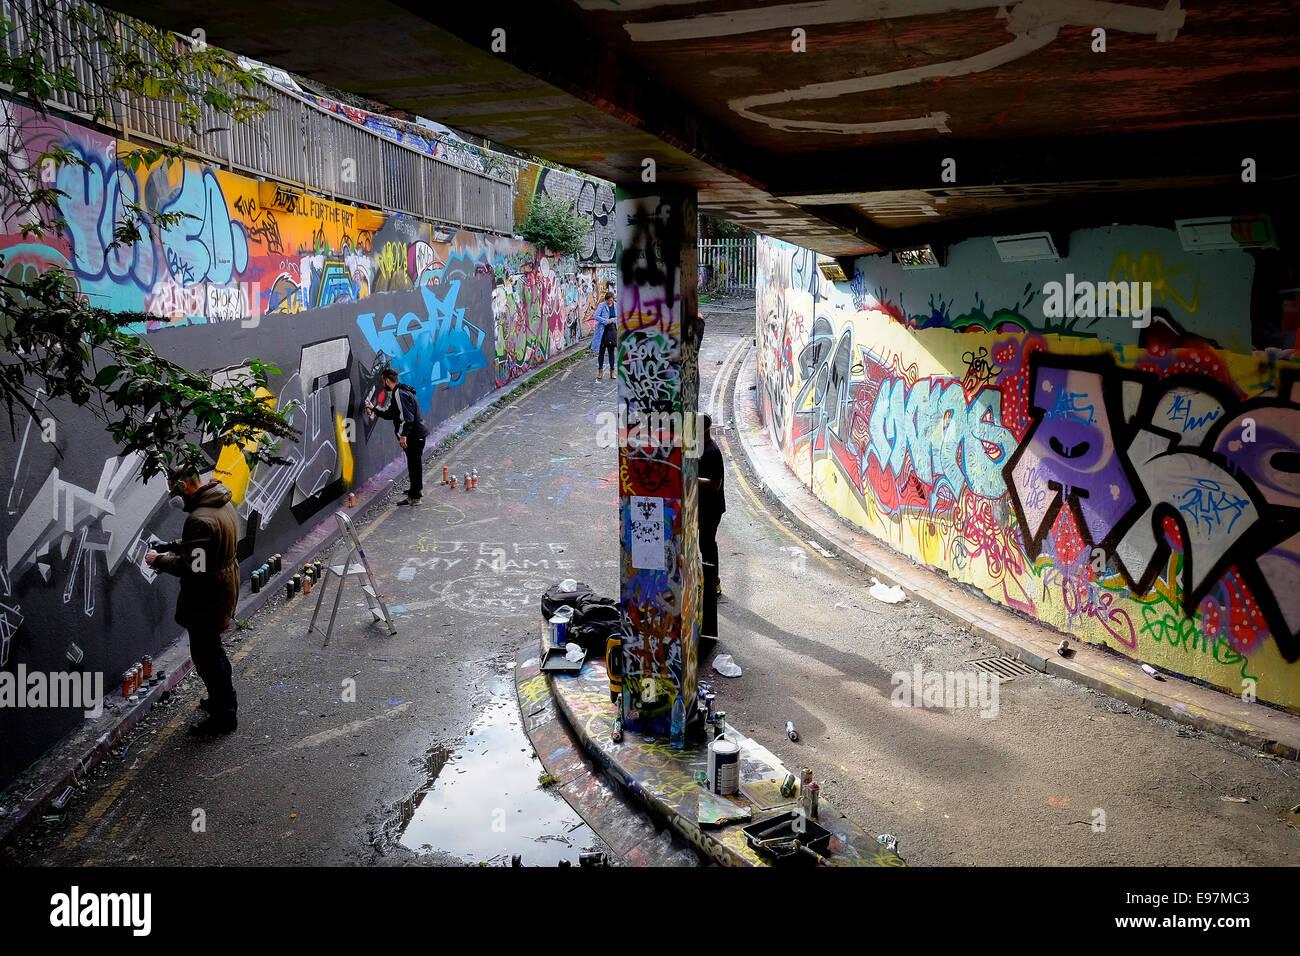 Graffiti-Künstler Dekoration einer Wand in Leake Street in Waterloo. Stockbild